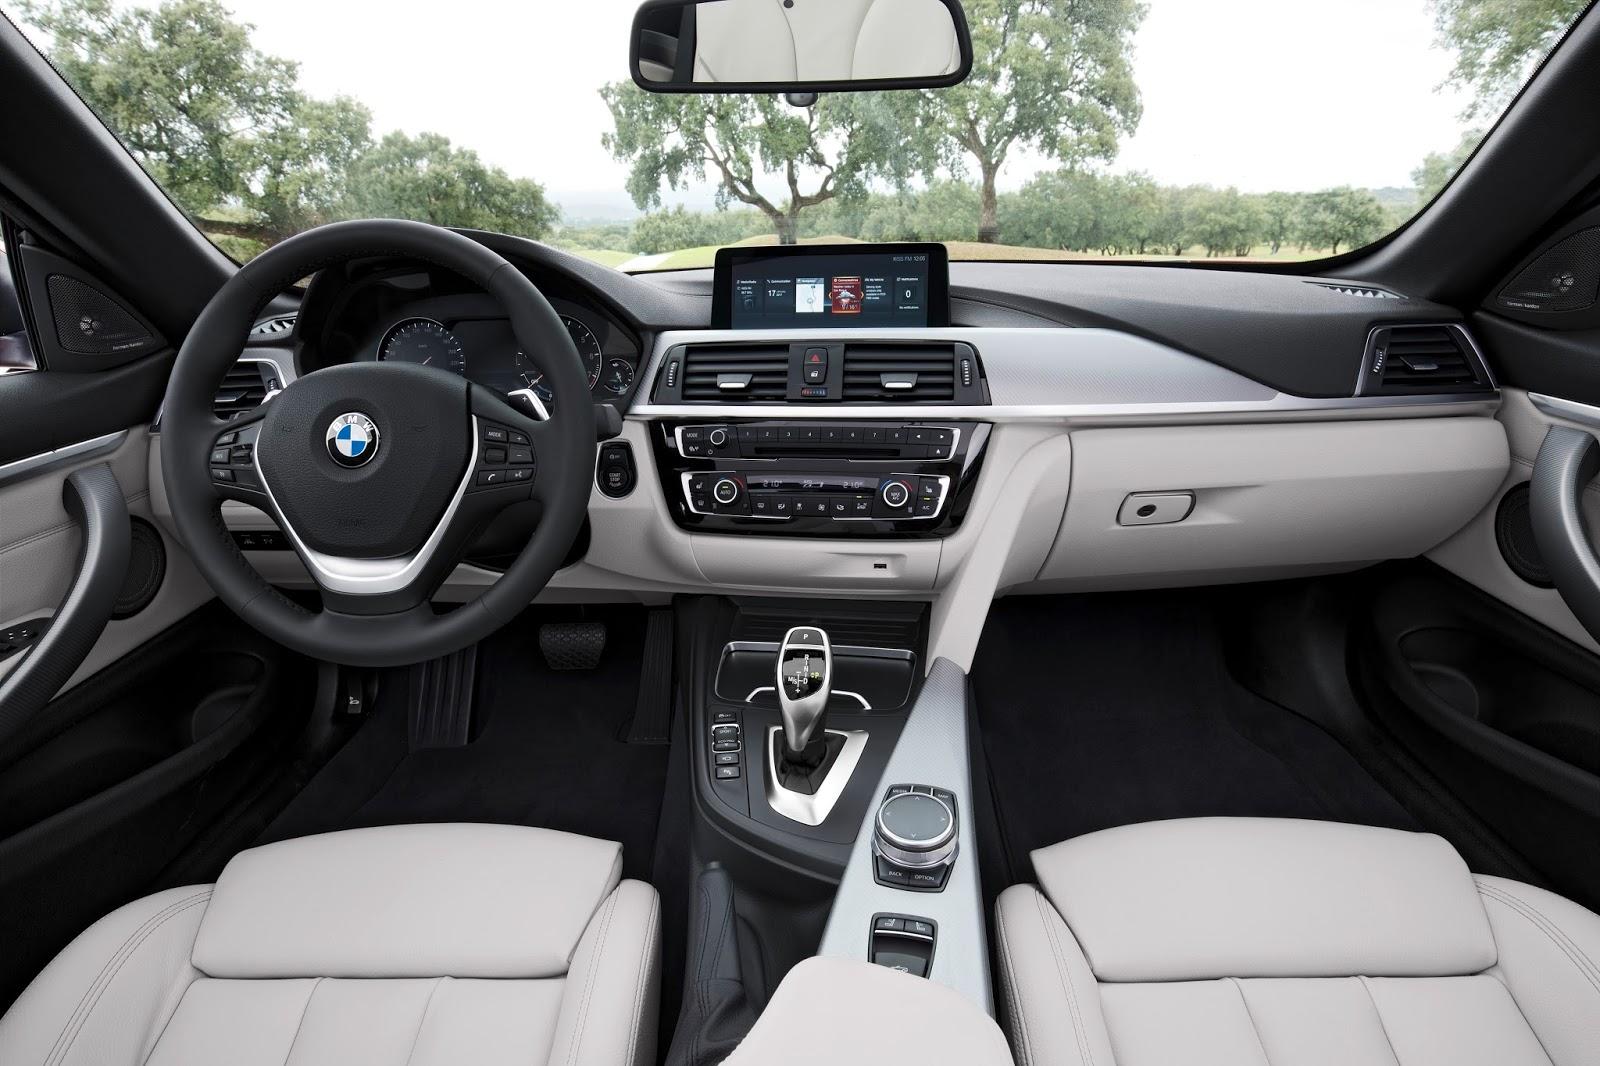 P90245301 highRes the new bmw series i Η νέα BMW Σειρά 4, με πιο σφιχτή ρύθμιση ανάρτησης BMW, Bmw 4, BMW 4 Cabrio, BMW 4 Coupe, BMW 4 Gran Coupé, Facelift